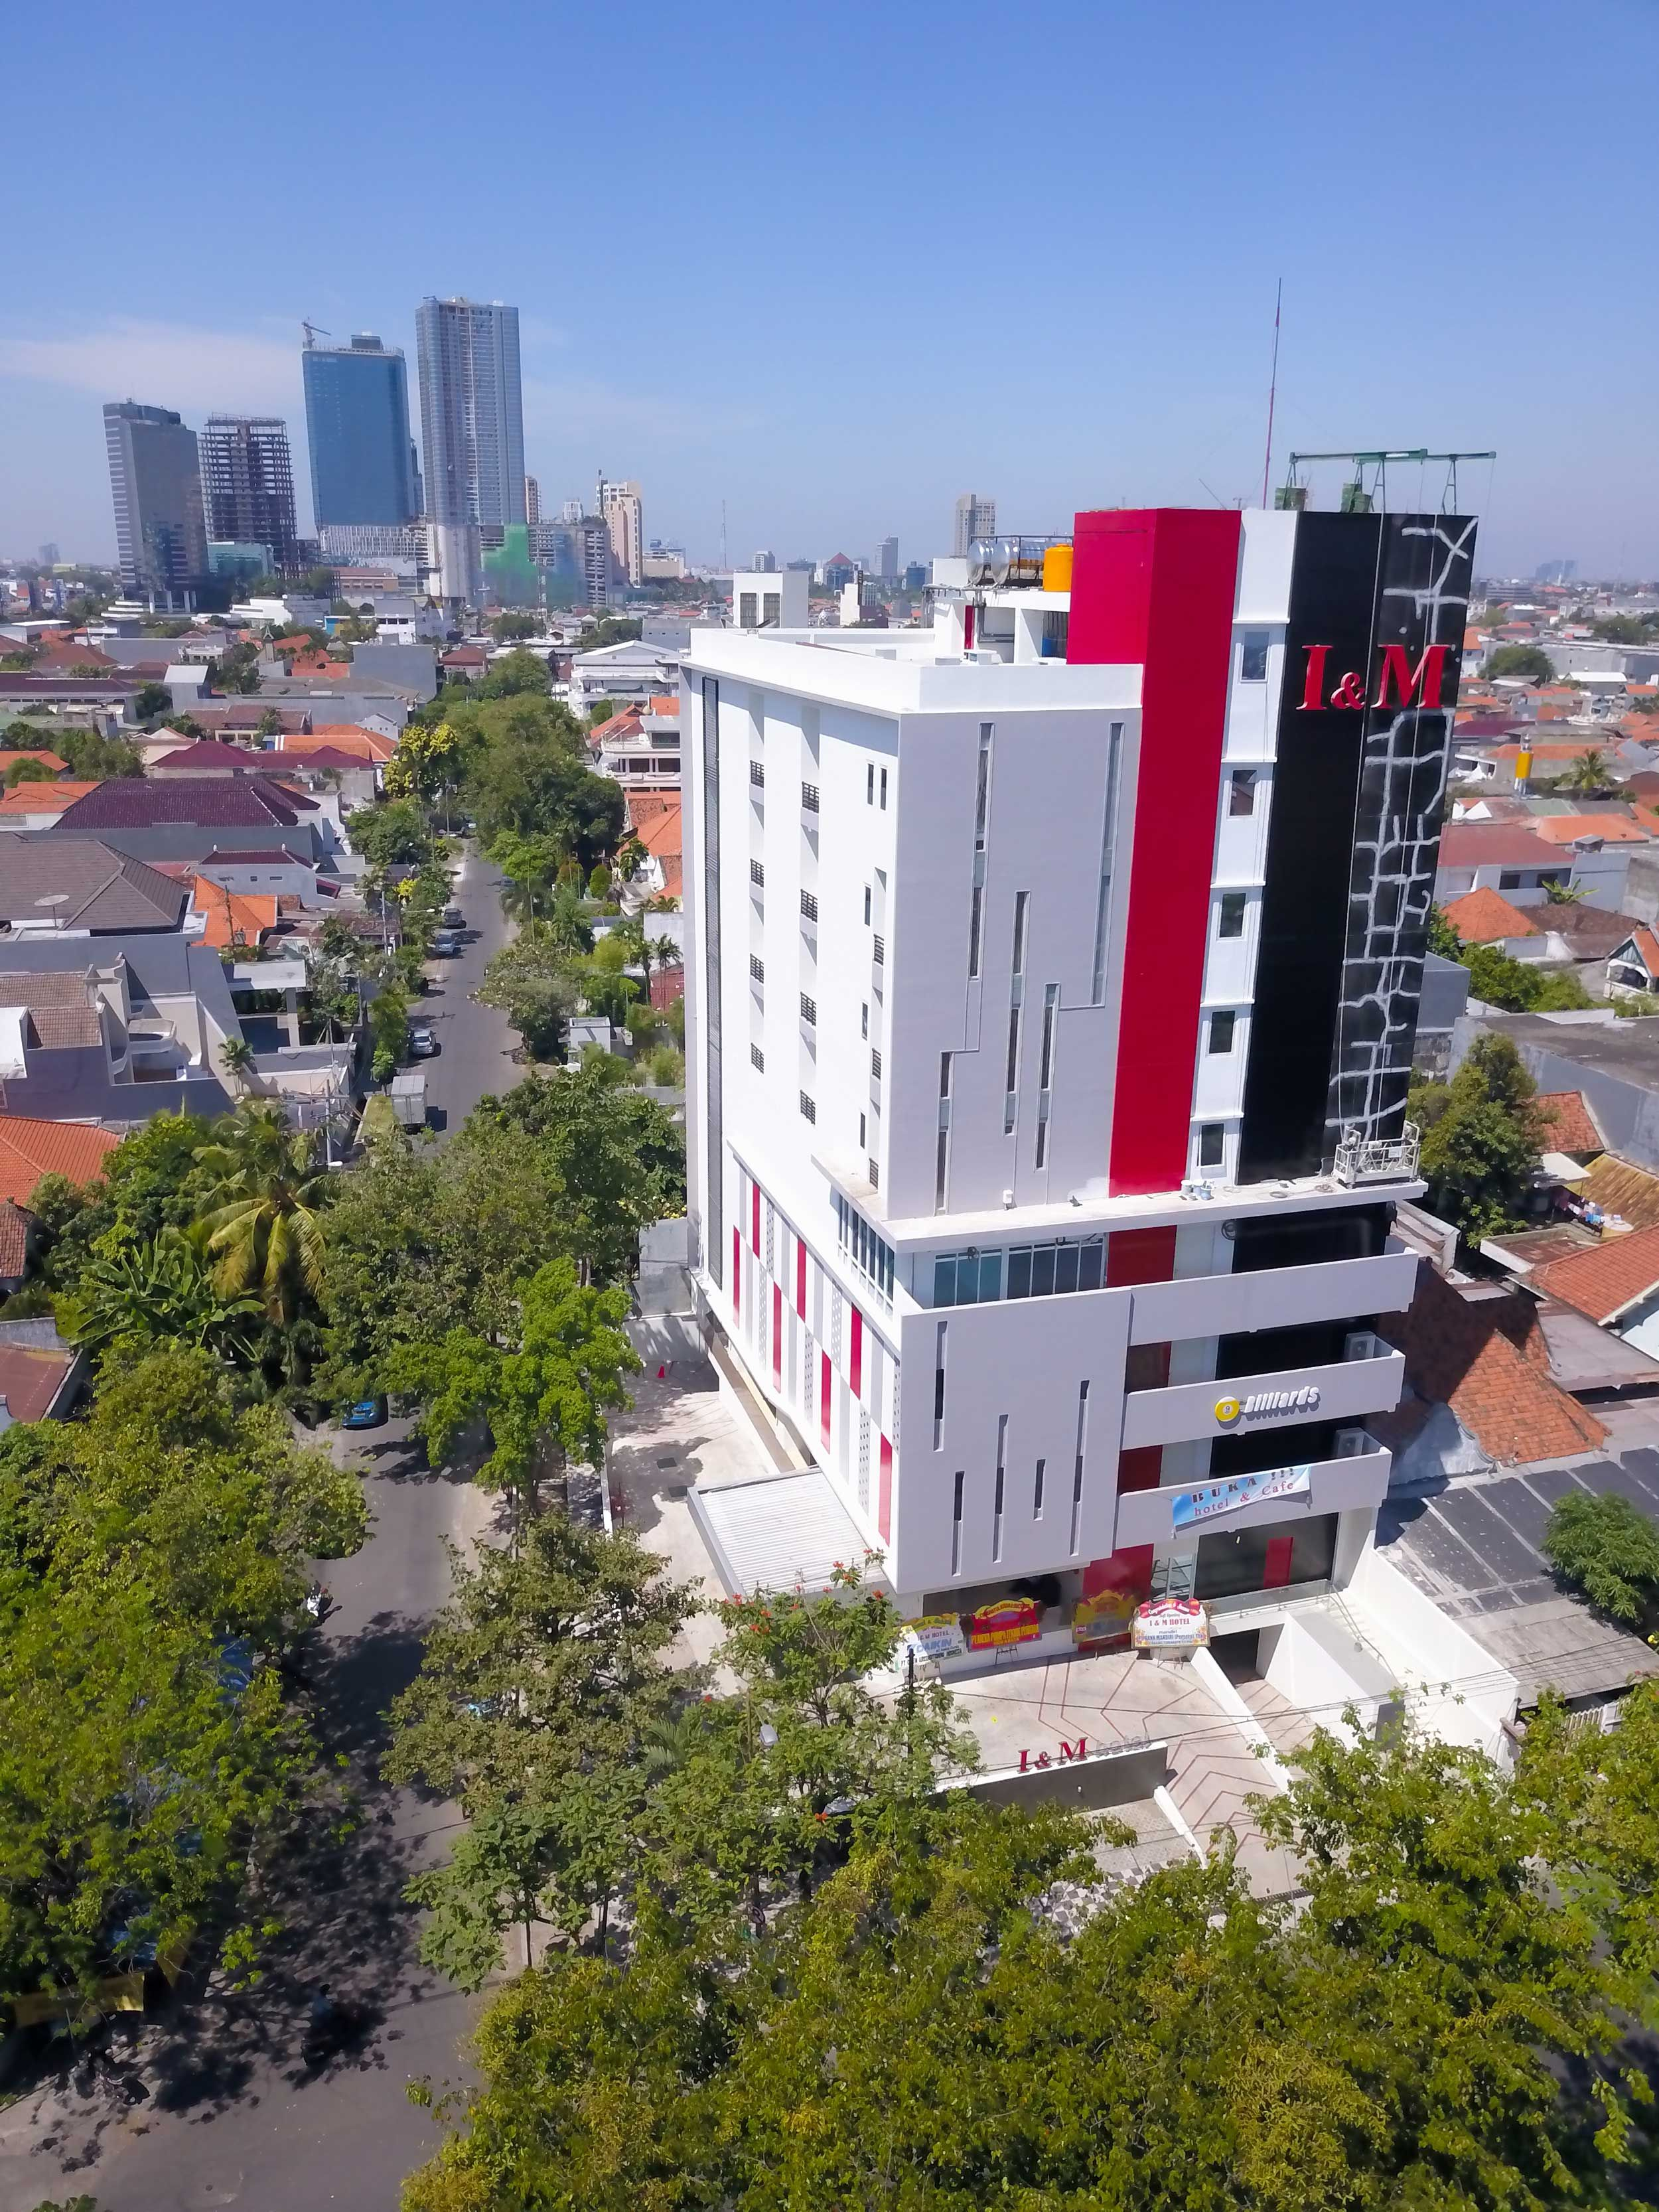 I&M ( Ivana & Michelle) Hotel, Surabaya